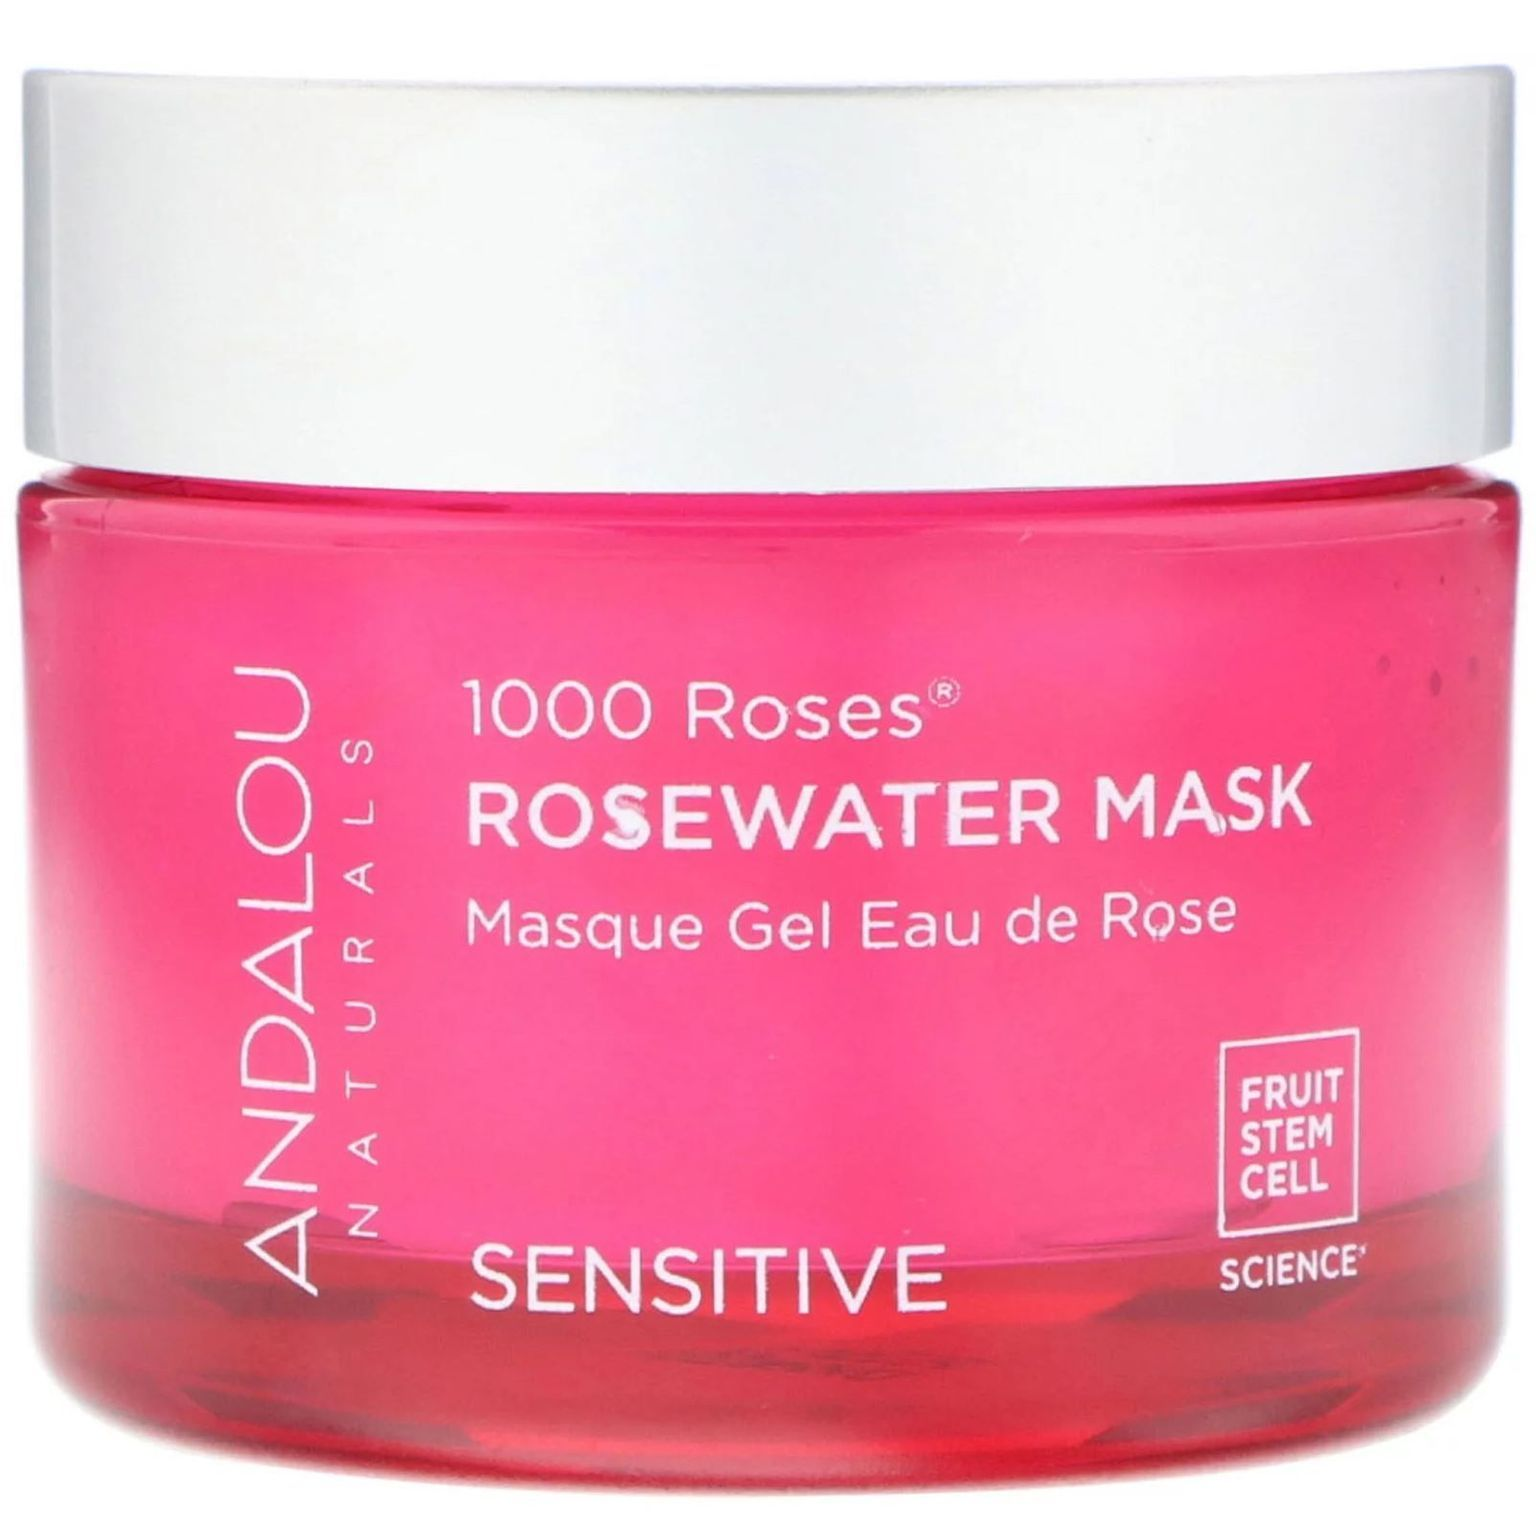 1000 Roses ROSEWATER Mask